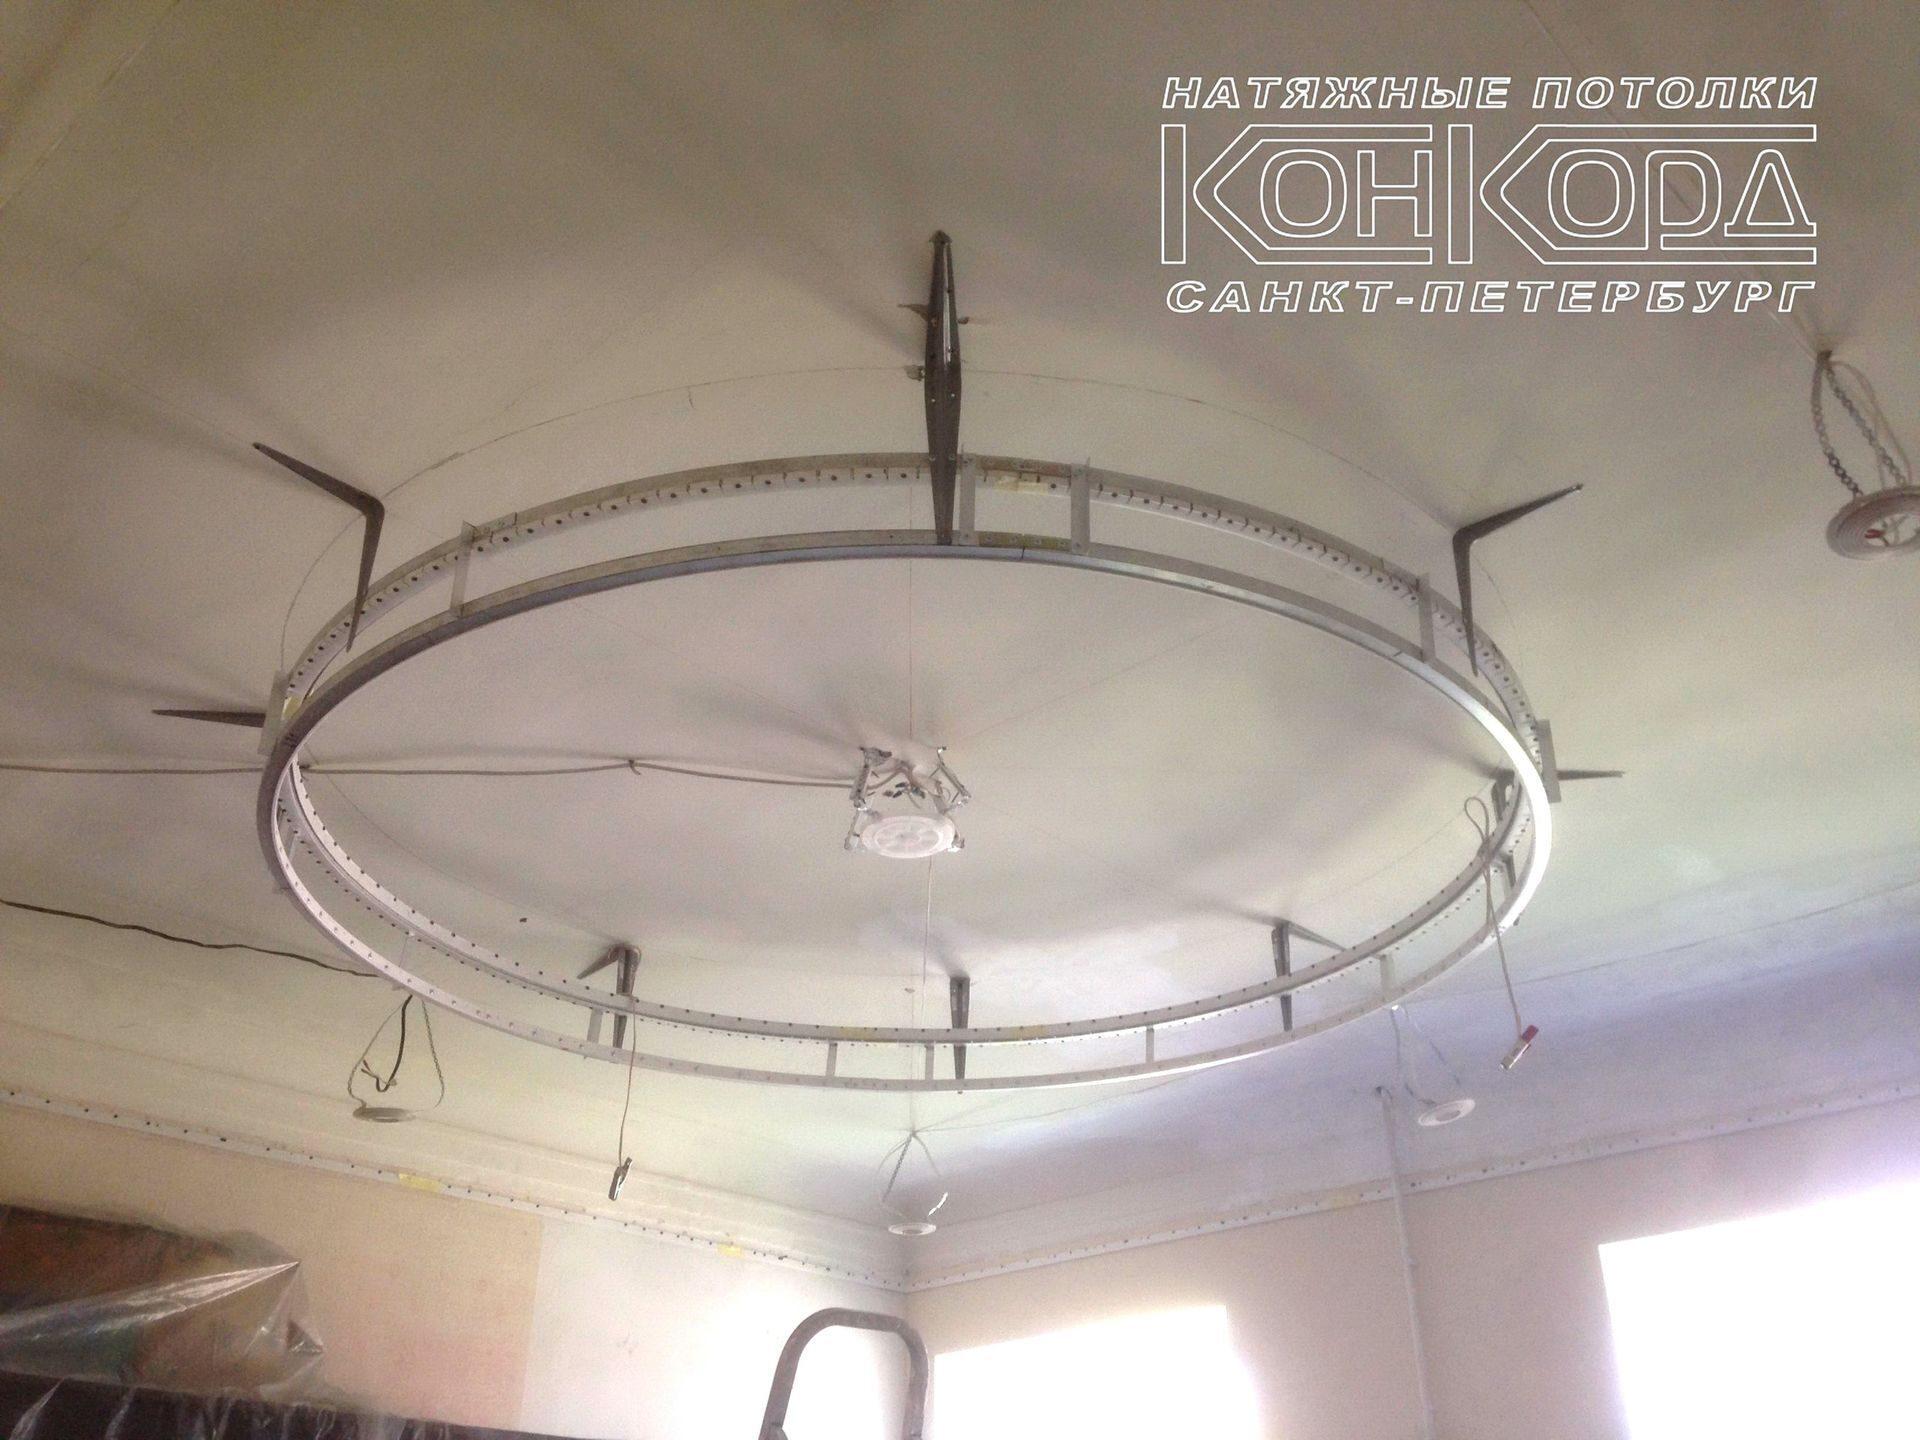 Работа маляром-штукатуром от 50000 руб у метро Трубная